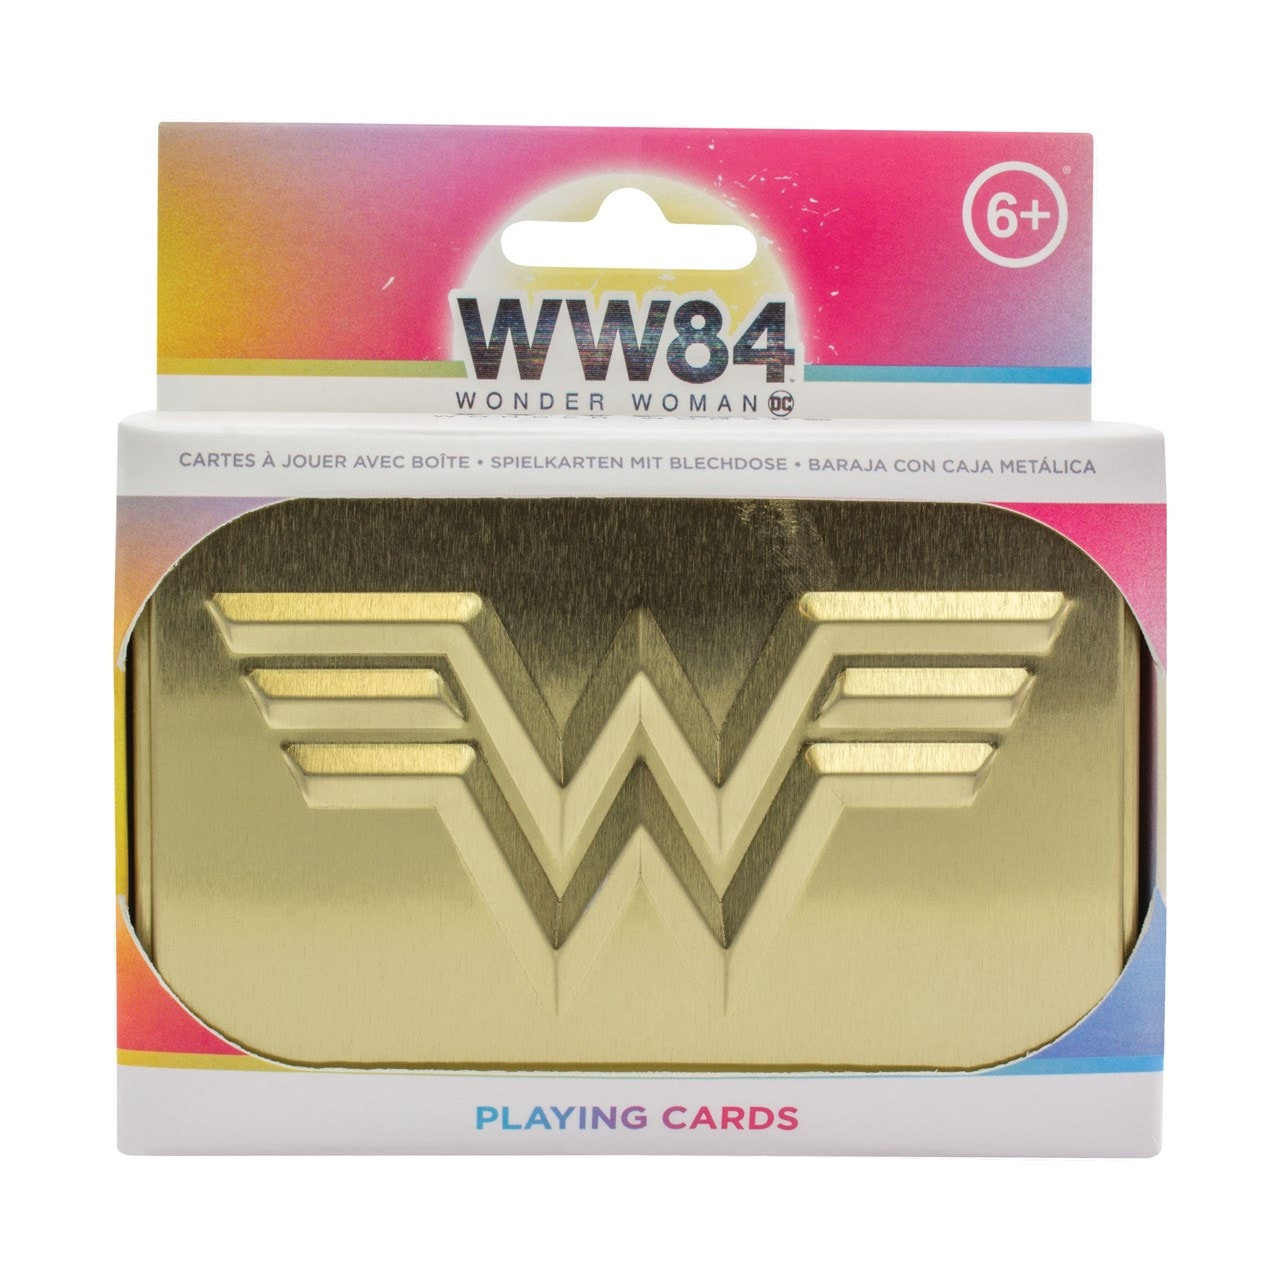 Wonder Woman 1984 Playing Cards - 1